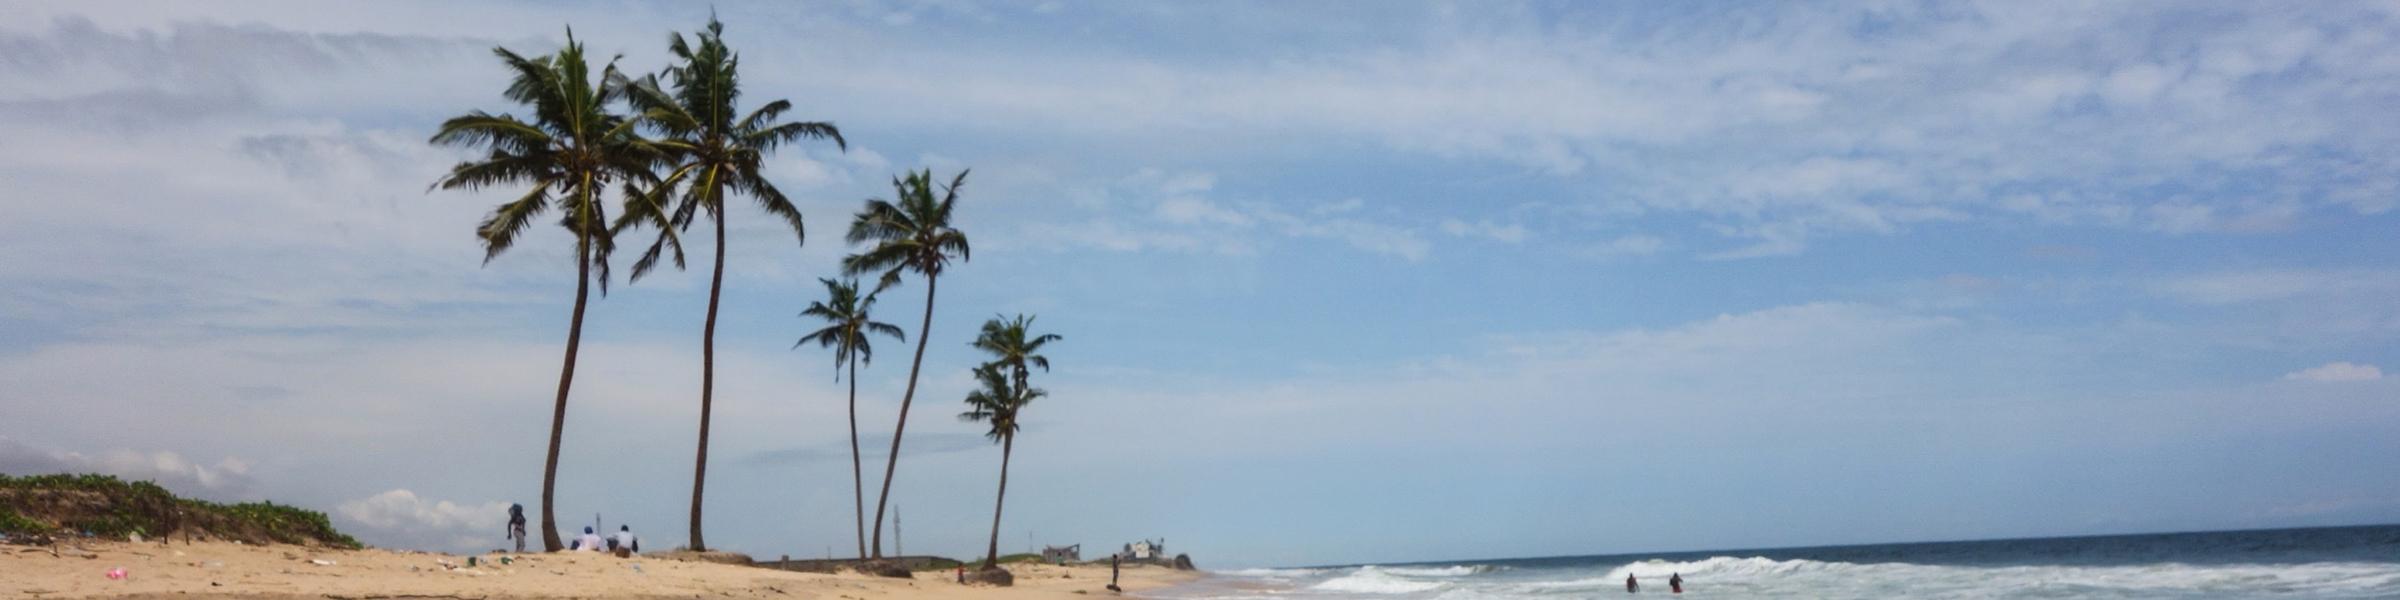 Nigeria Lagos Lekki Beach